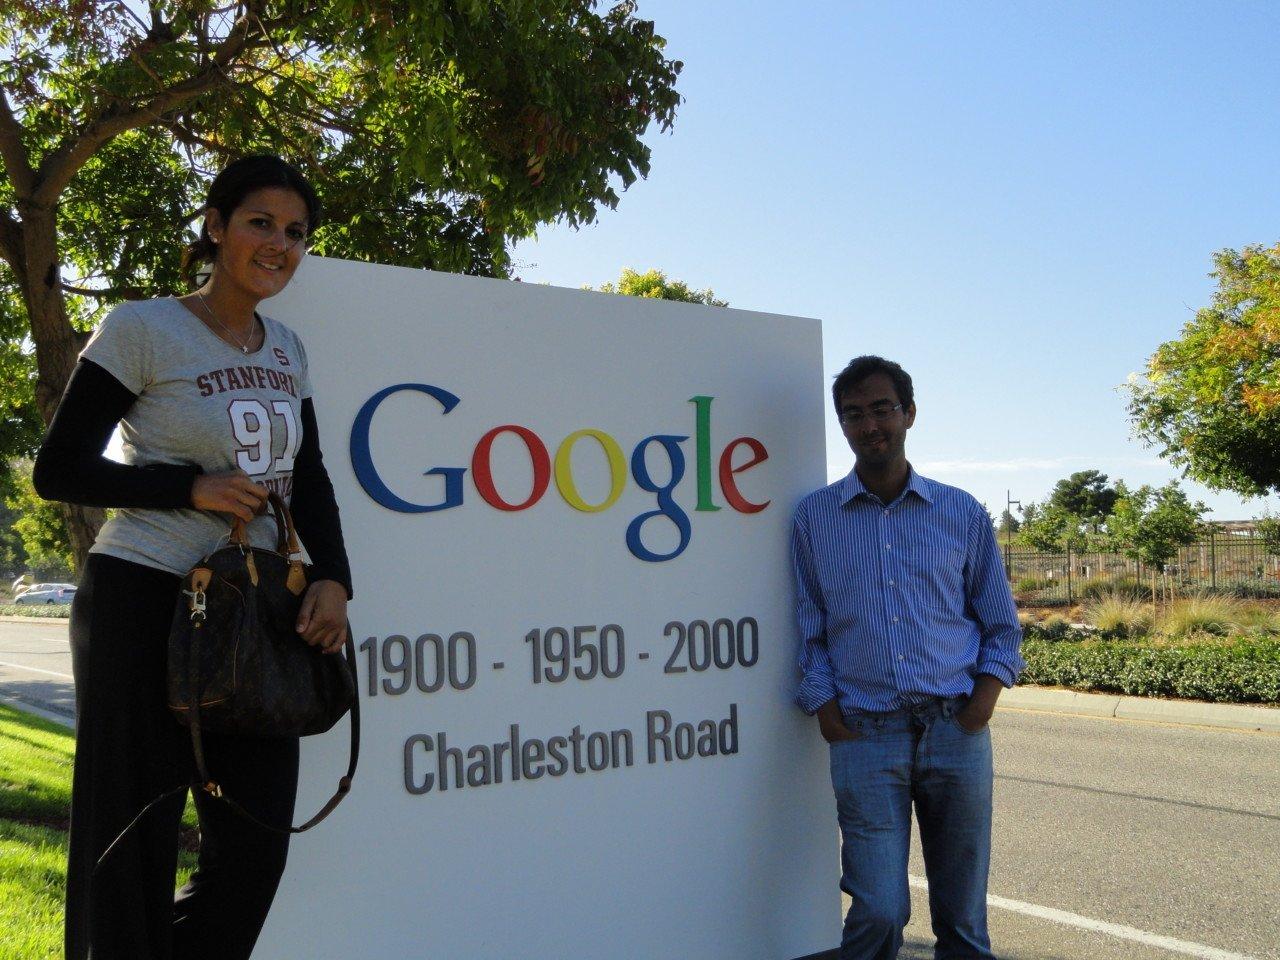 google charleston road, california 3 giorni a san francisco, google site